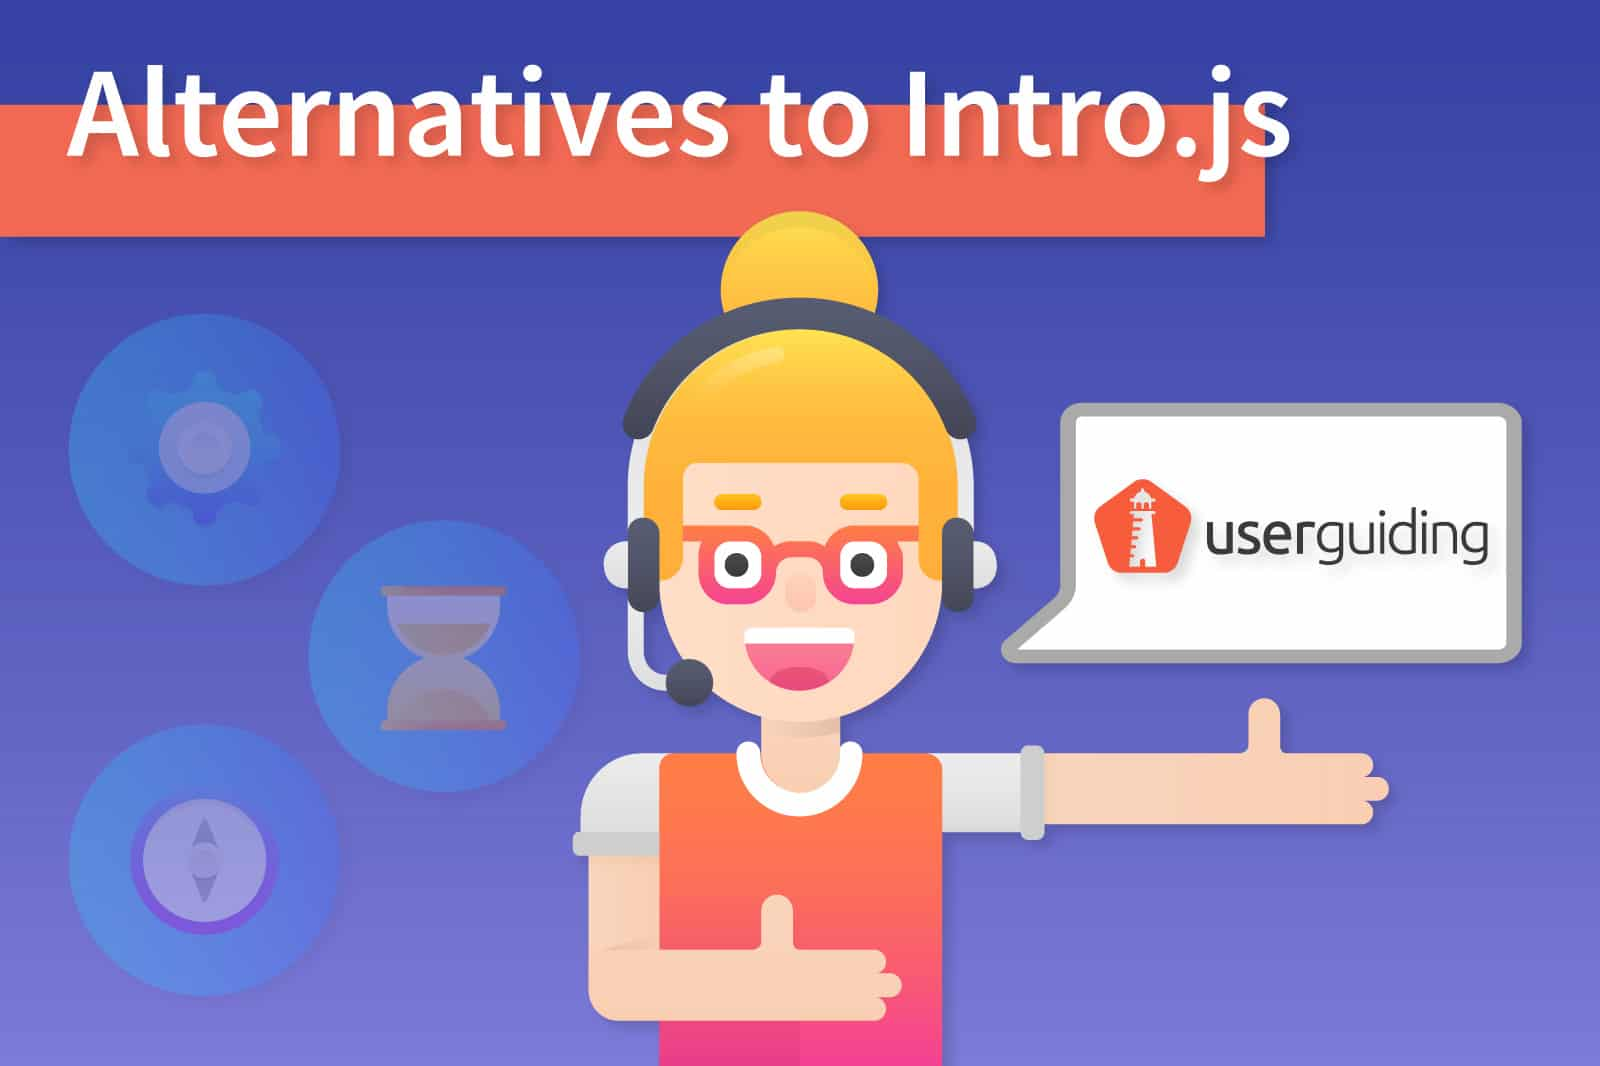 intro.js alternatives